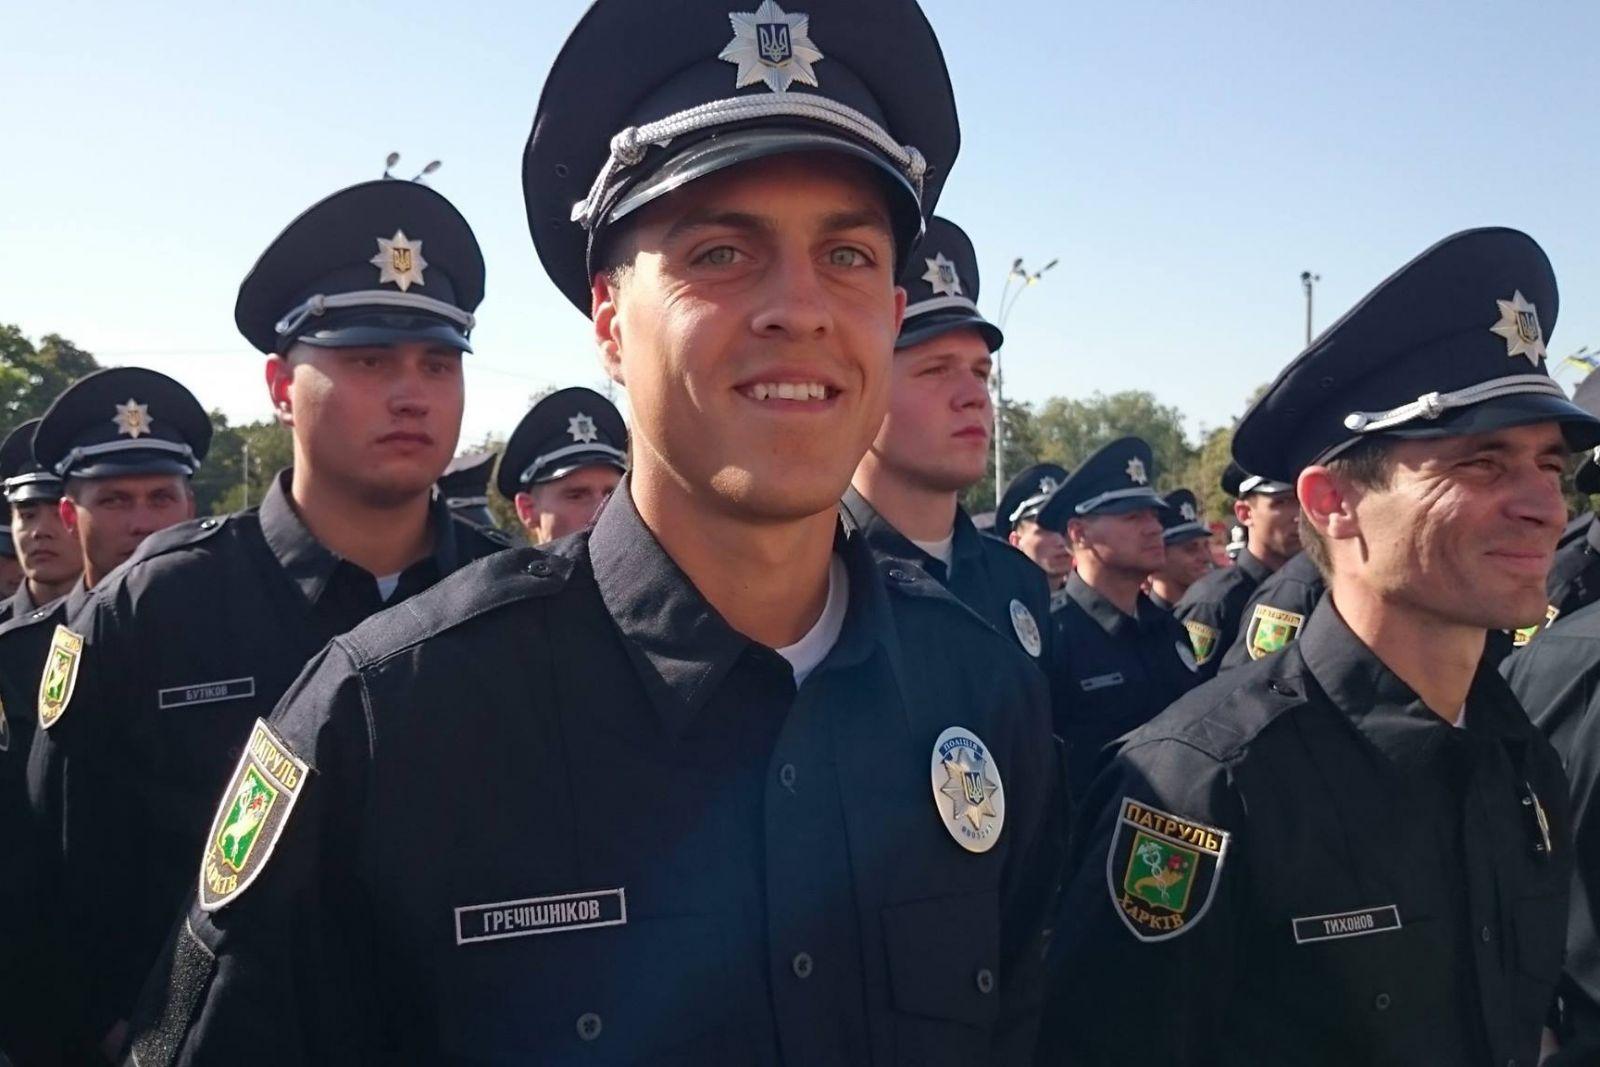 Сотрудников полиции избили в Харькове